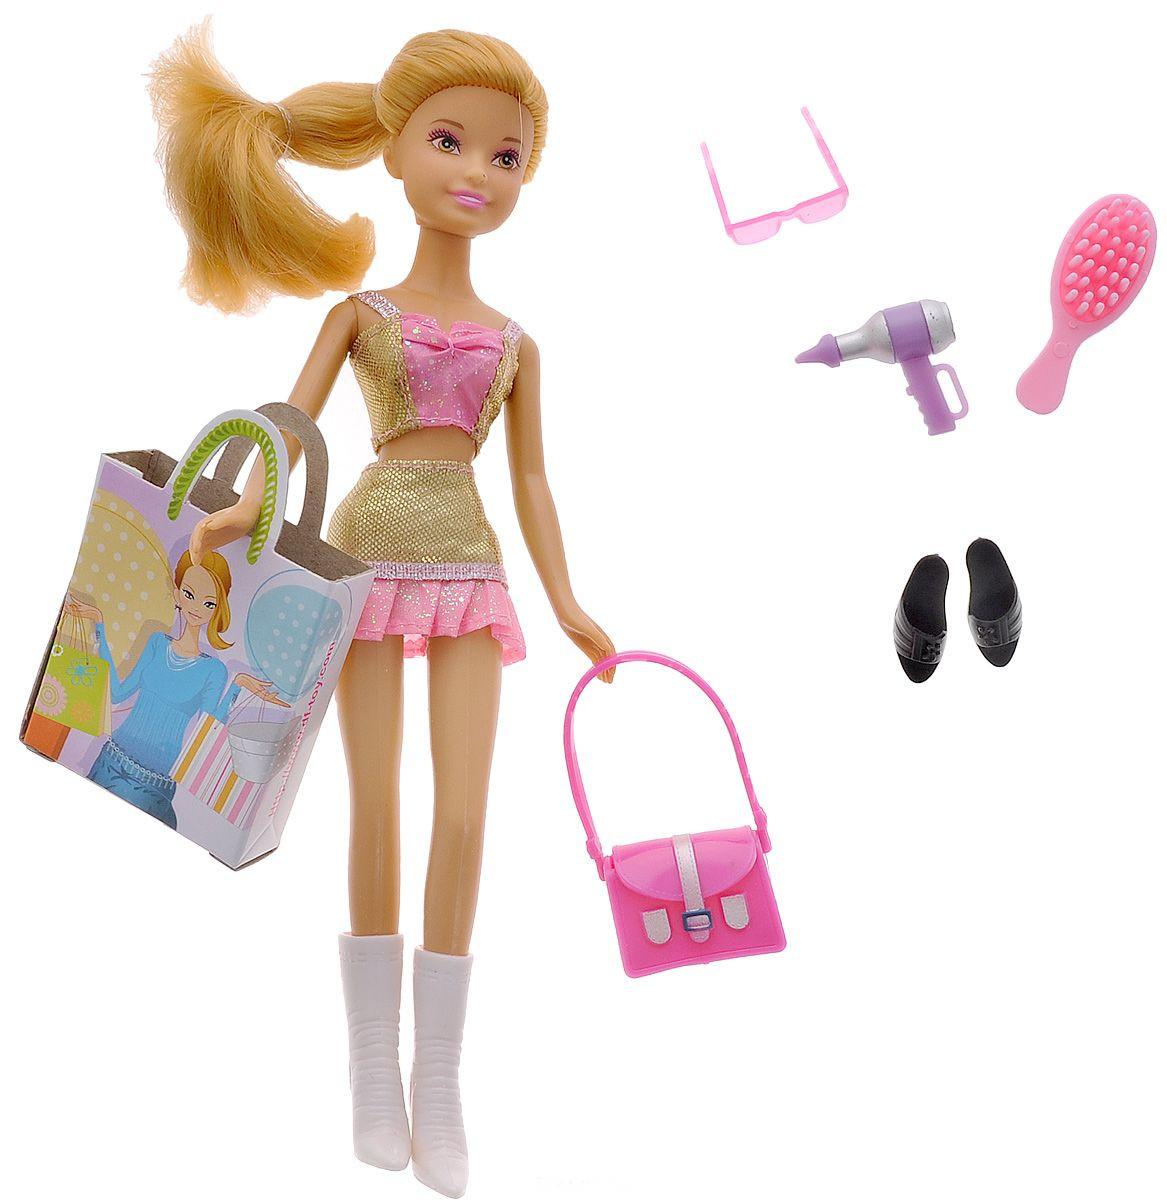 Кукла Lucy – Модница с аксессуарамиКуклы Defa Lucy<br>Кукла Lucy – Модница с аксессуарами<br>